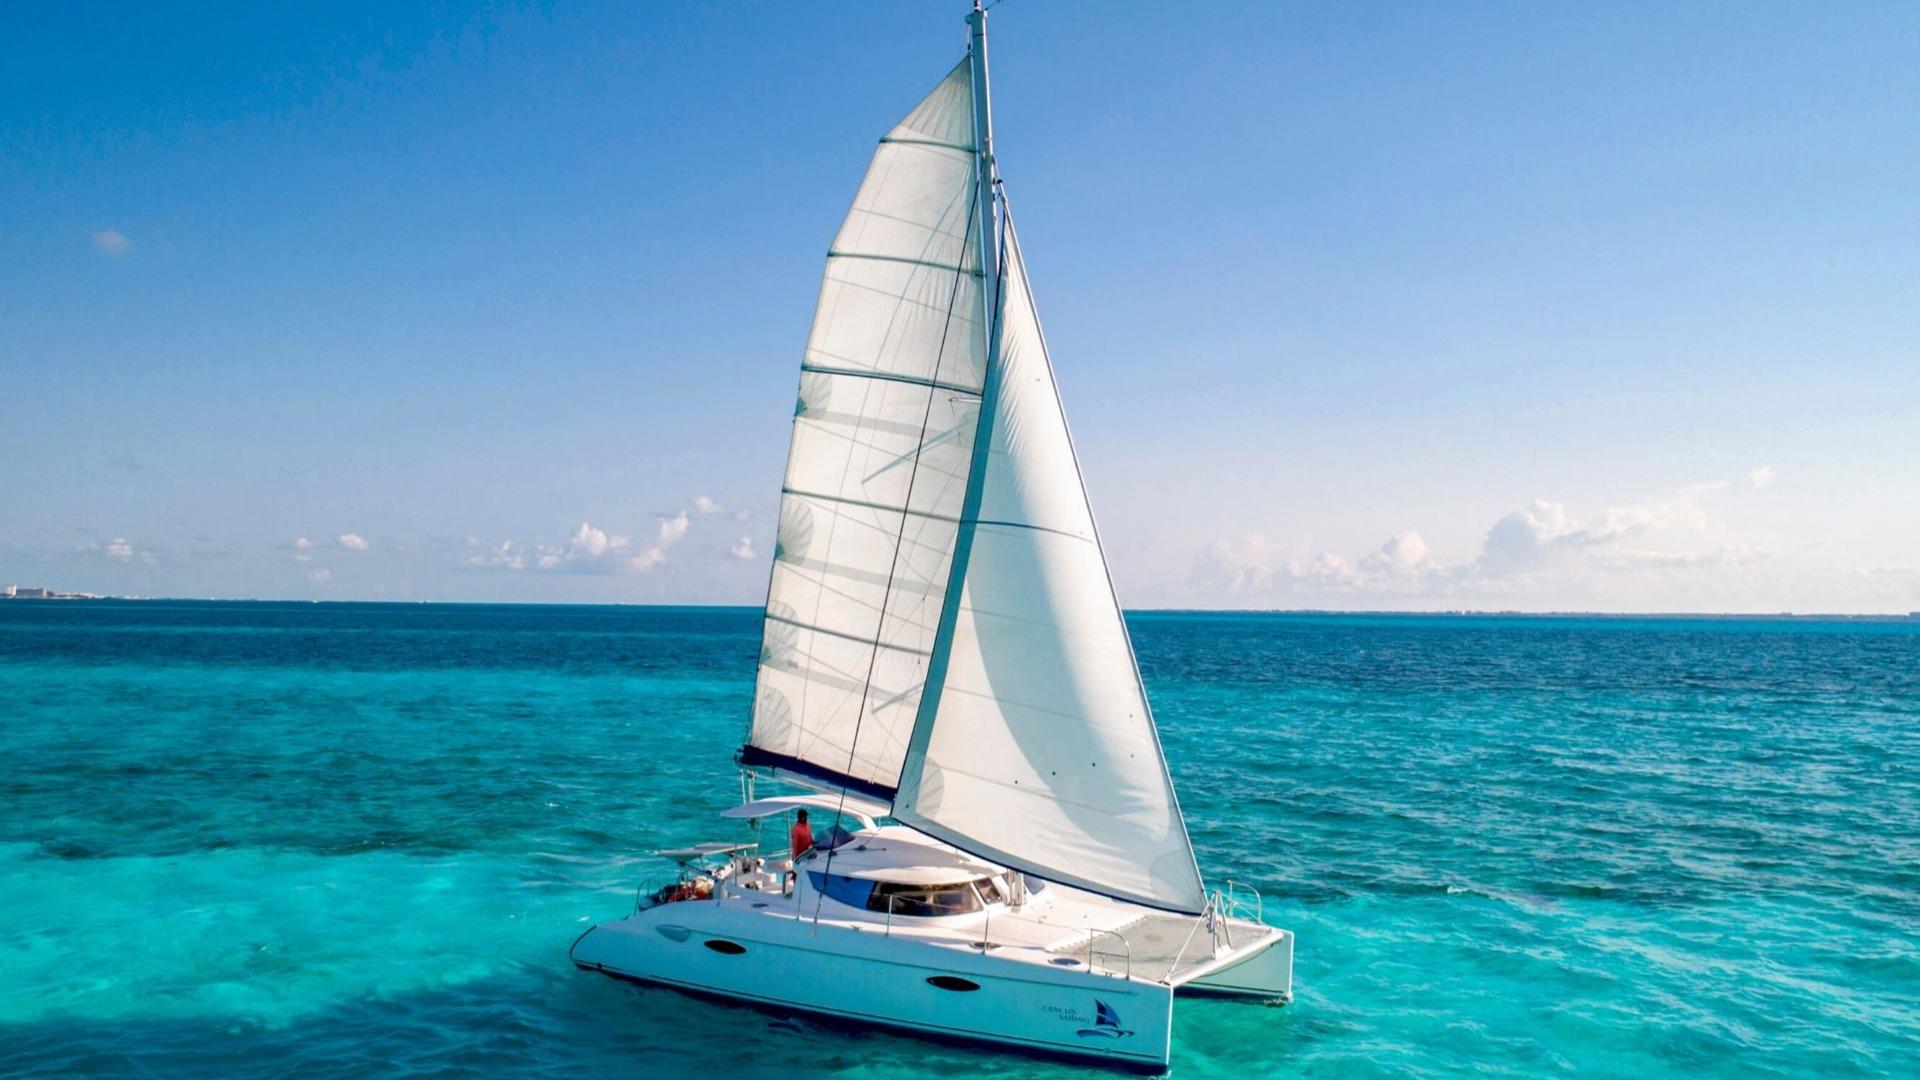 Kendo - Isla Mujeres Catamaran Tour - Cancun Sailing